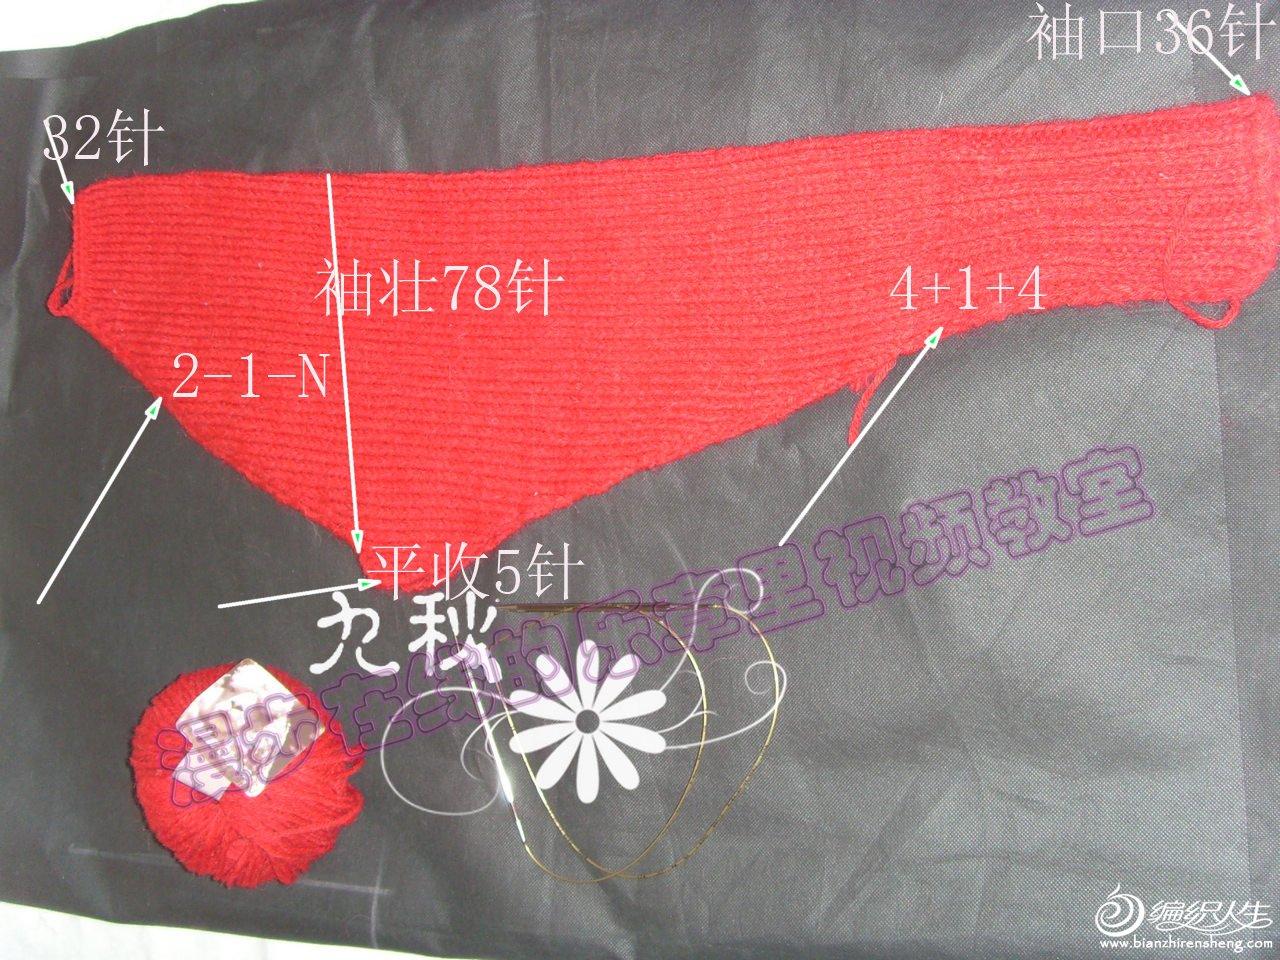 S73R5061.jpg